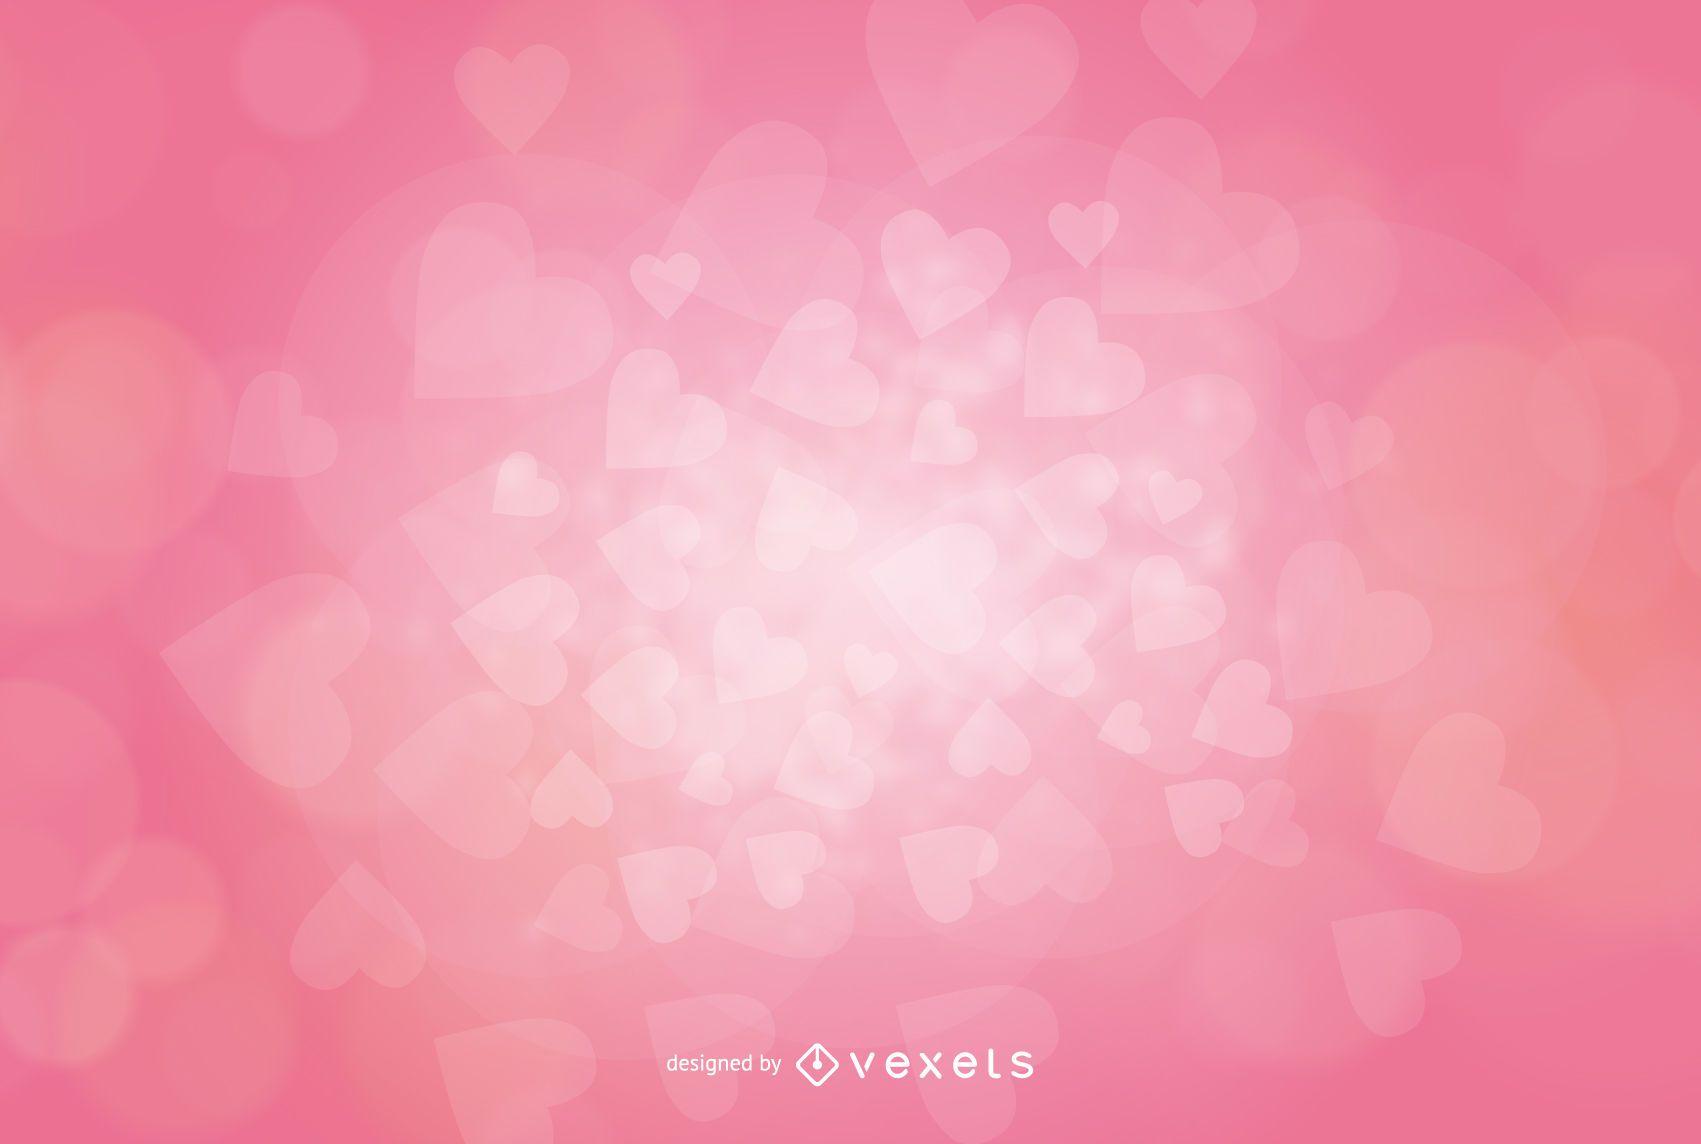 Corazones San Valentín Fluorescentes Sobre Fondo Rosa